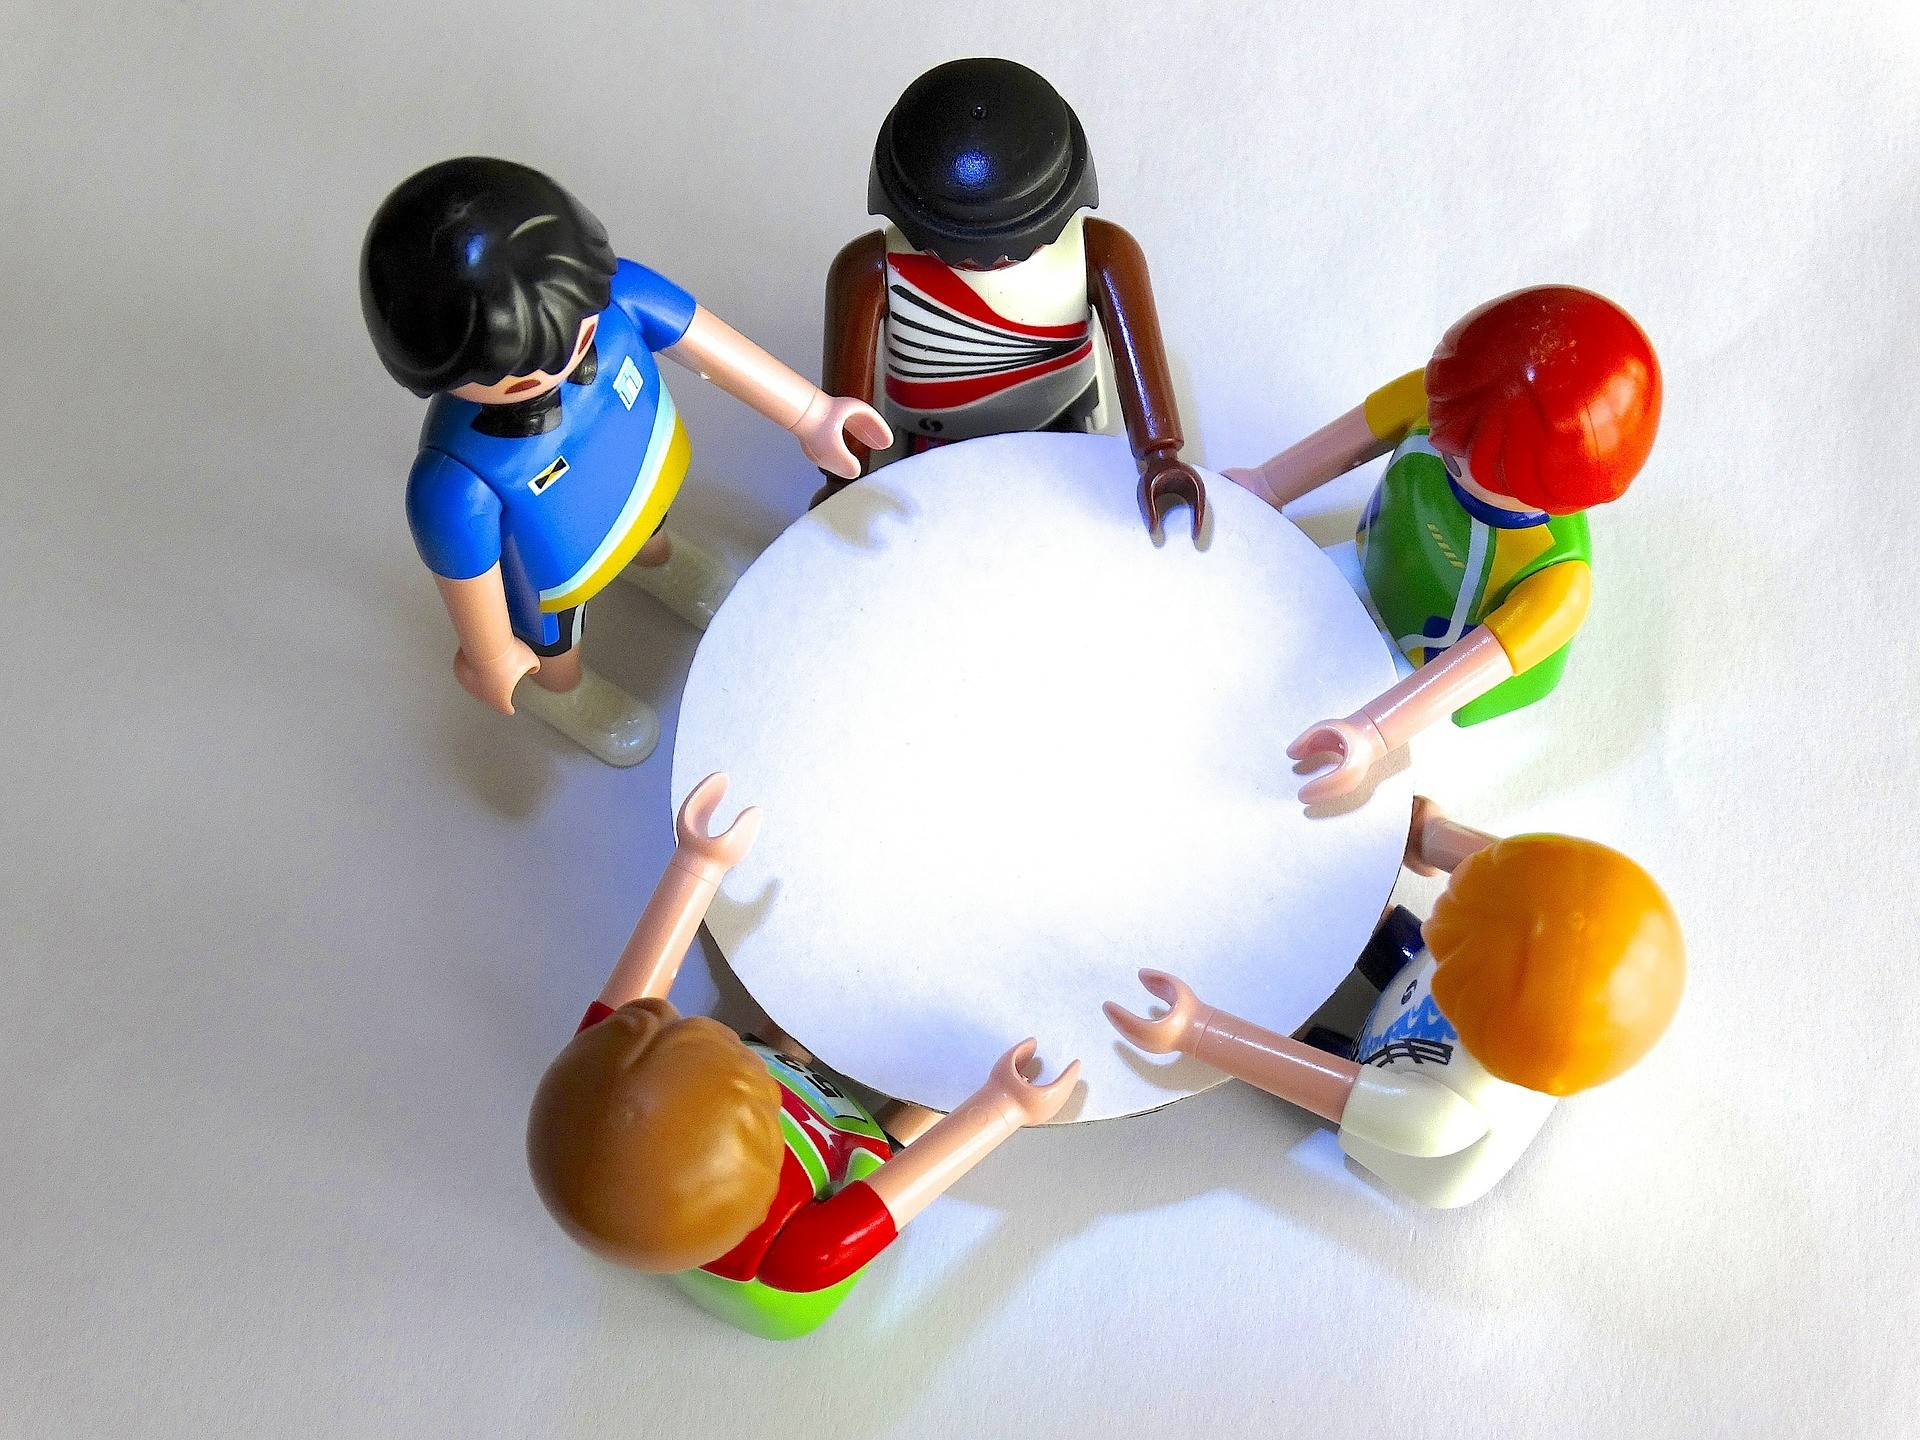 Runder Tisch Integration am 26. Oktober 2021